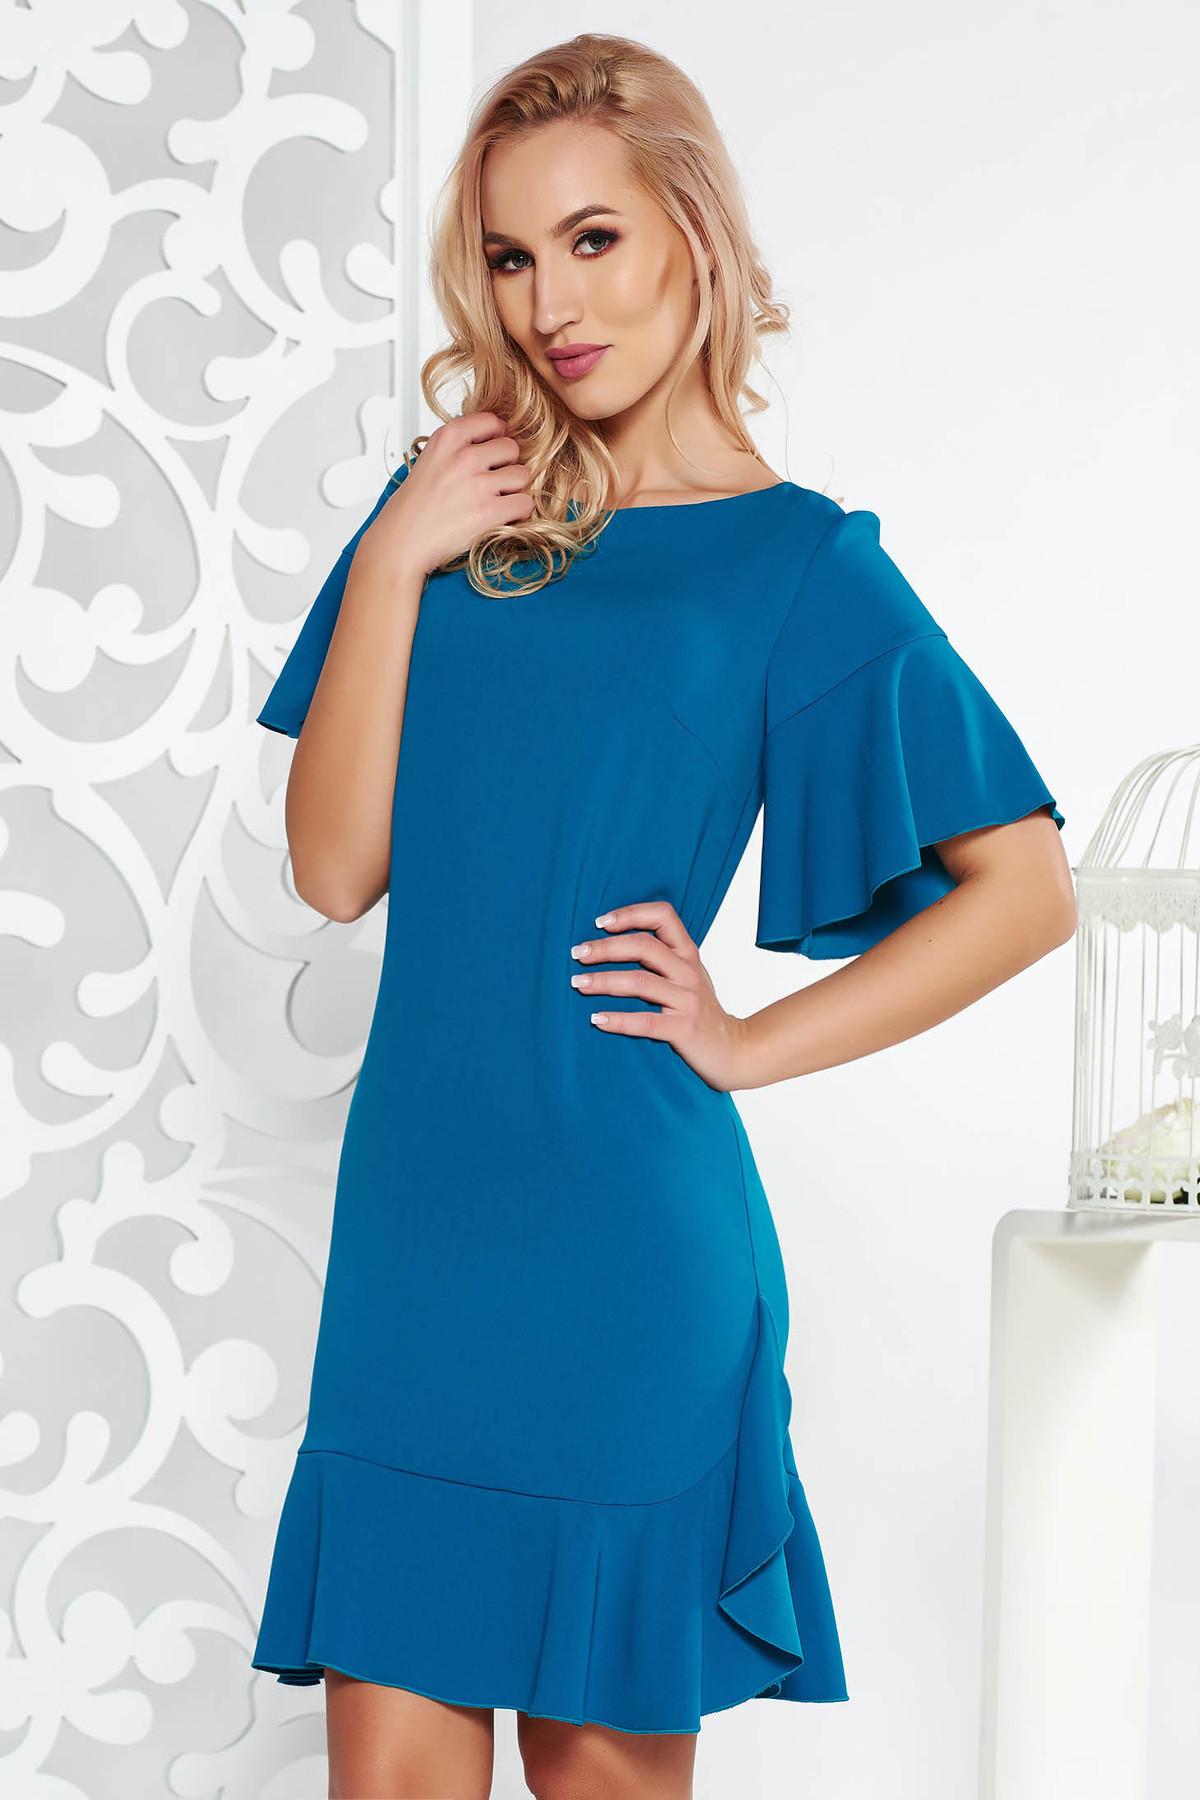 Rochie turcoaz eleganta din stofa usor elastica captusita pe interior cu un croi drept cu volanase la baza rochiei